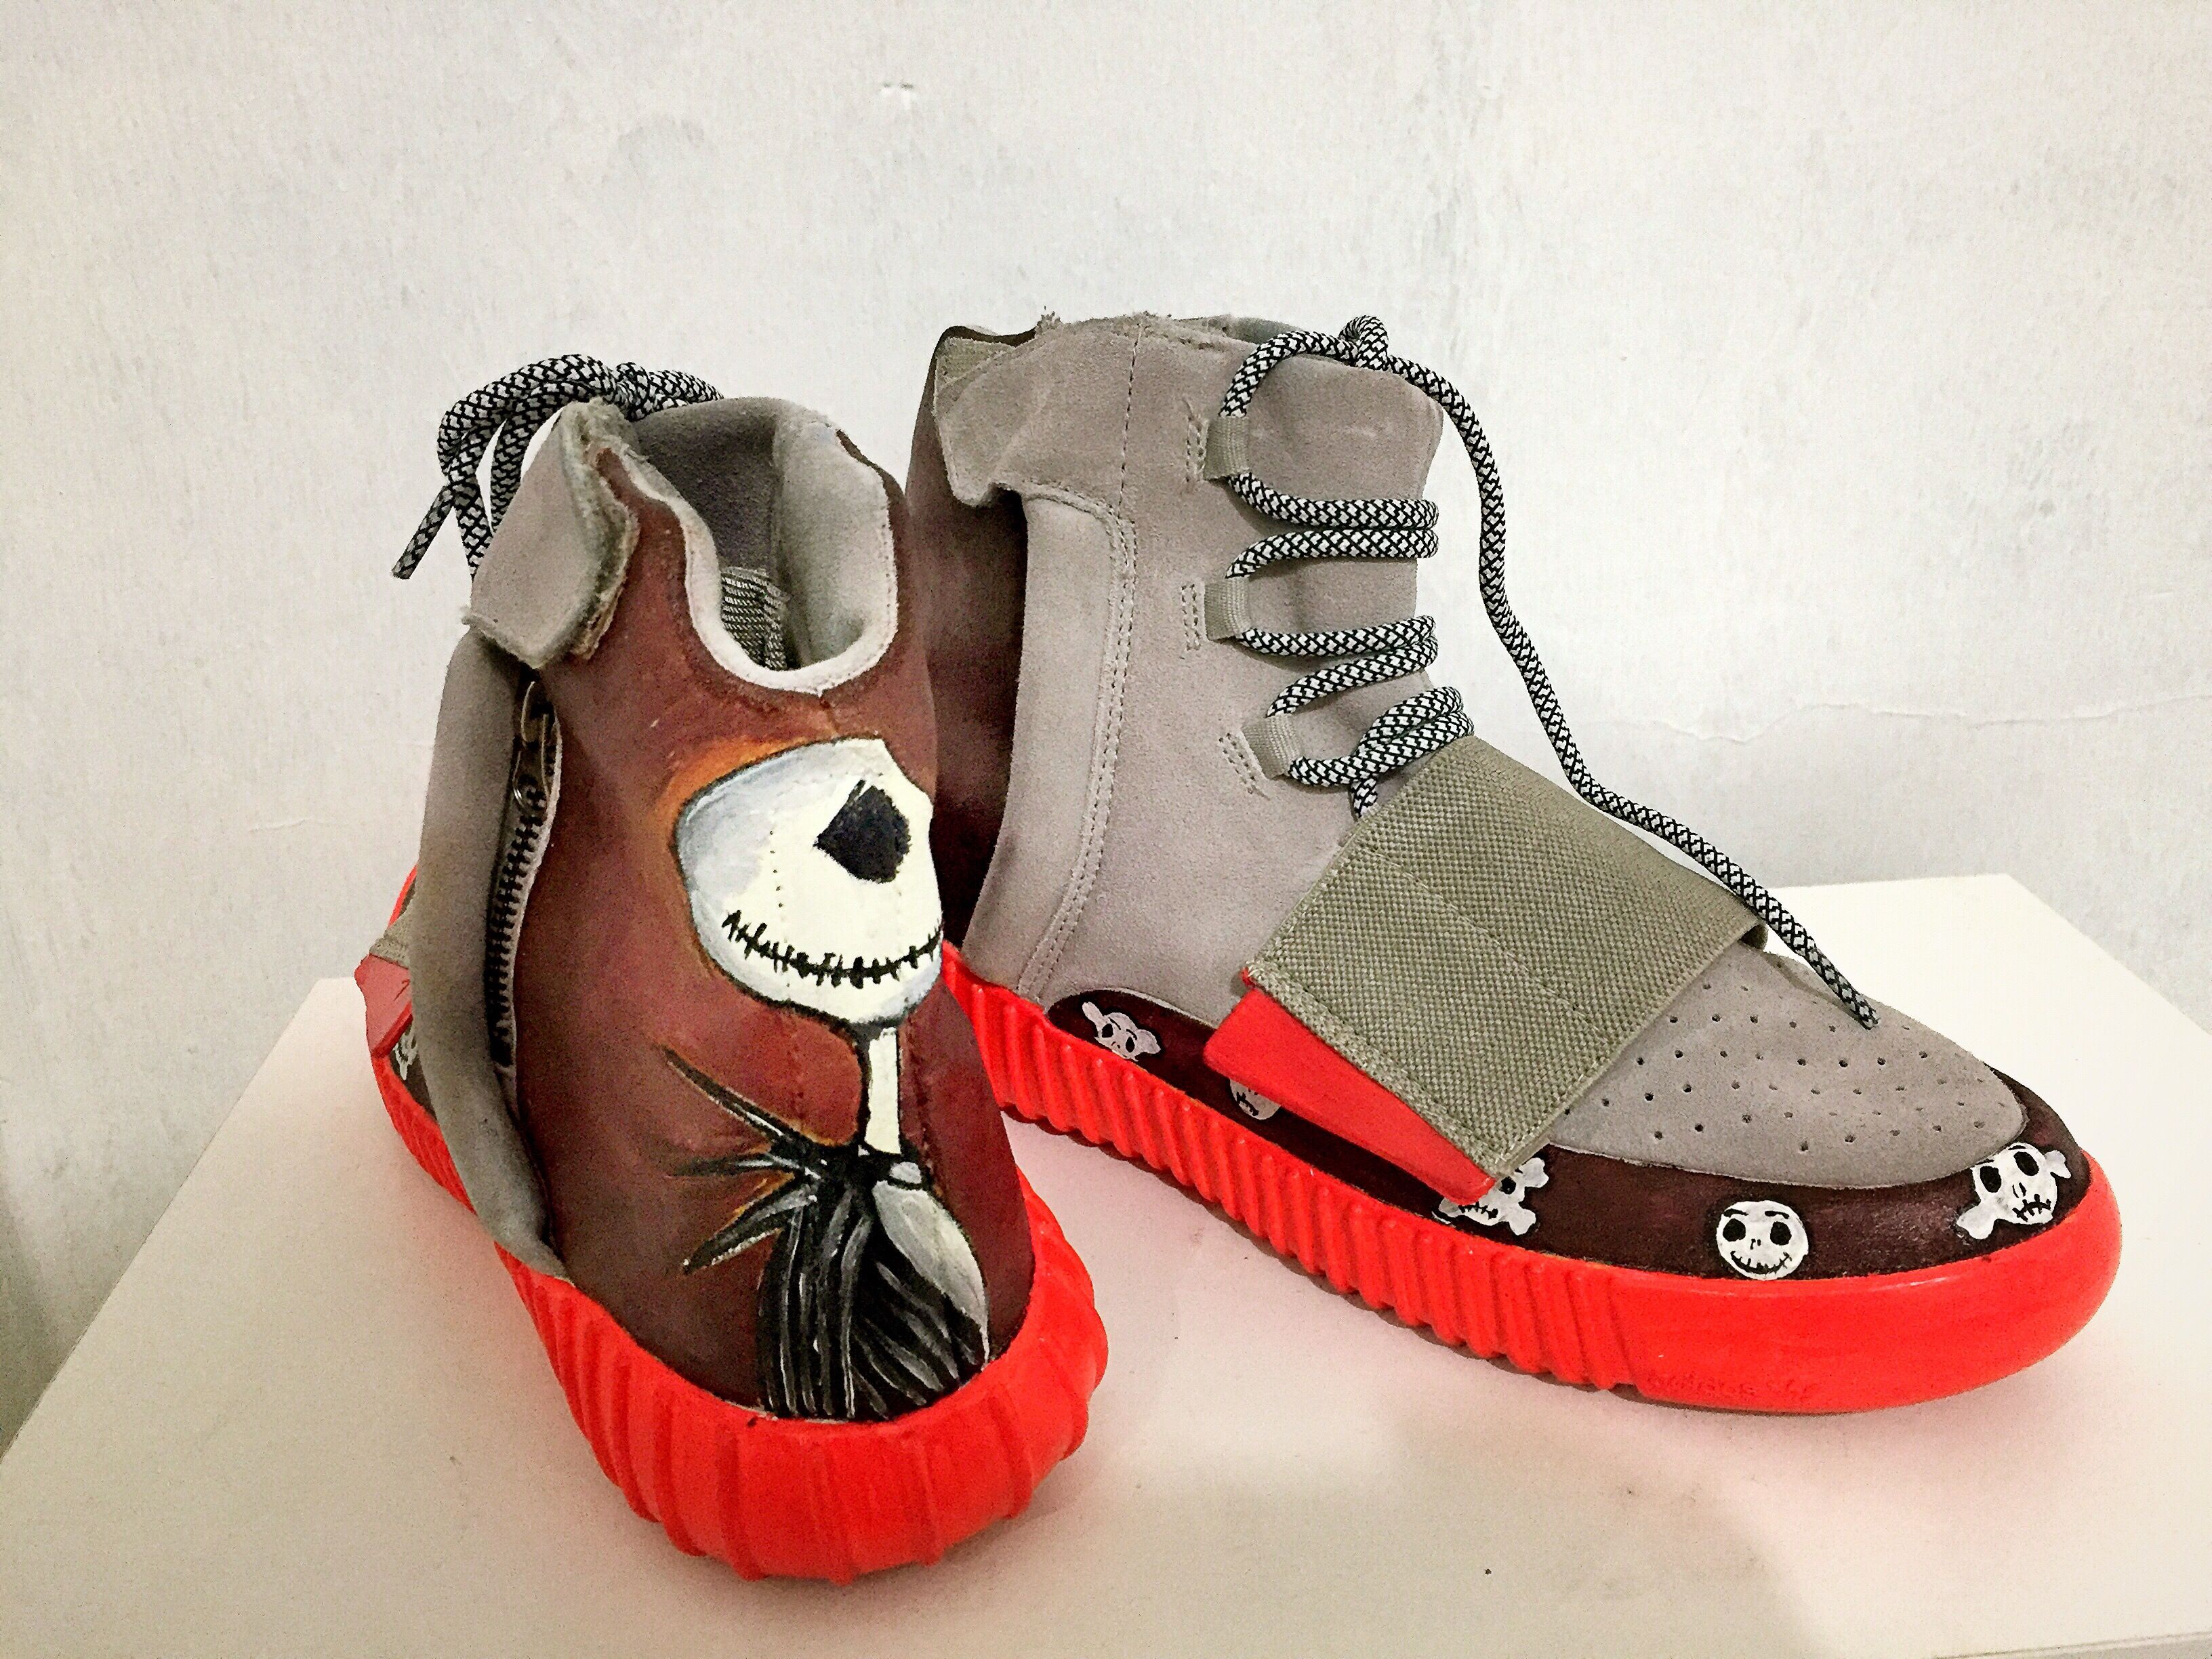 3a877ad0cc5 Adidas yeezy customized shoes jack and sally nightmare before christmas jpg  3264x2448 Custom yeezy 750